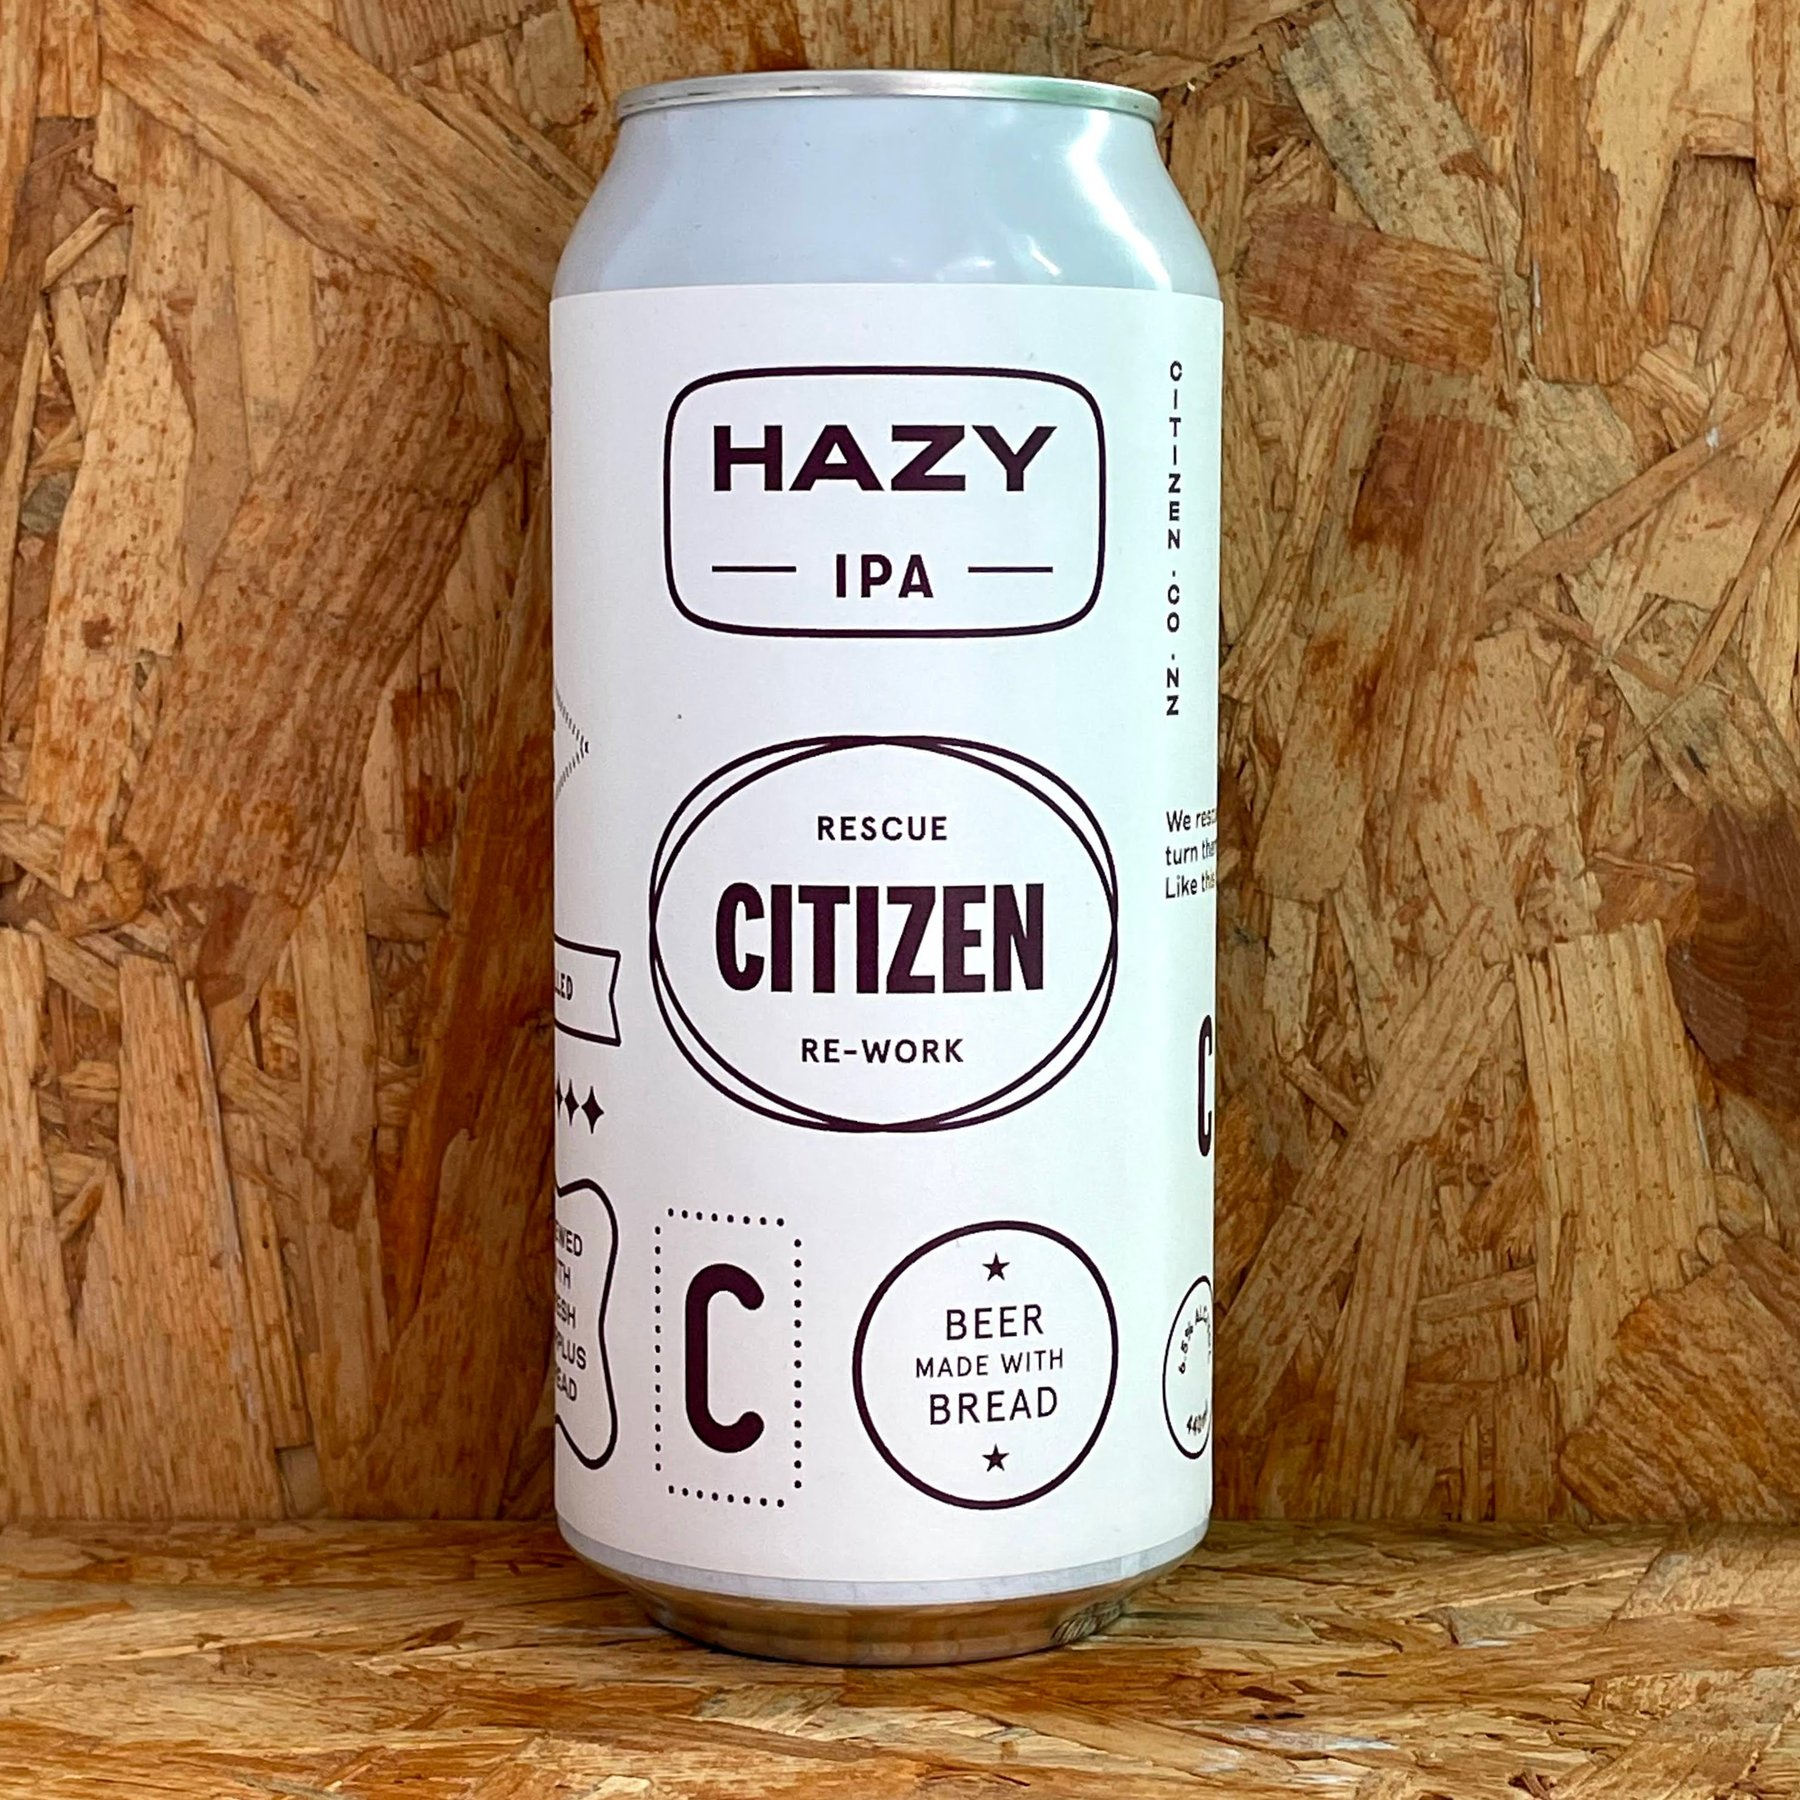 Citizen / Hazy IPA 6.5% - 440ml can